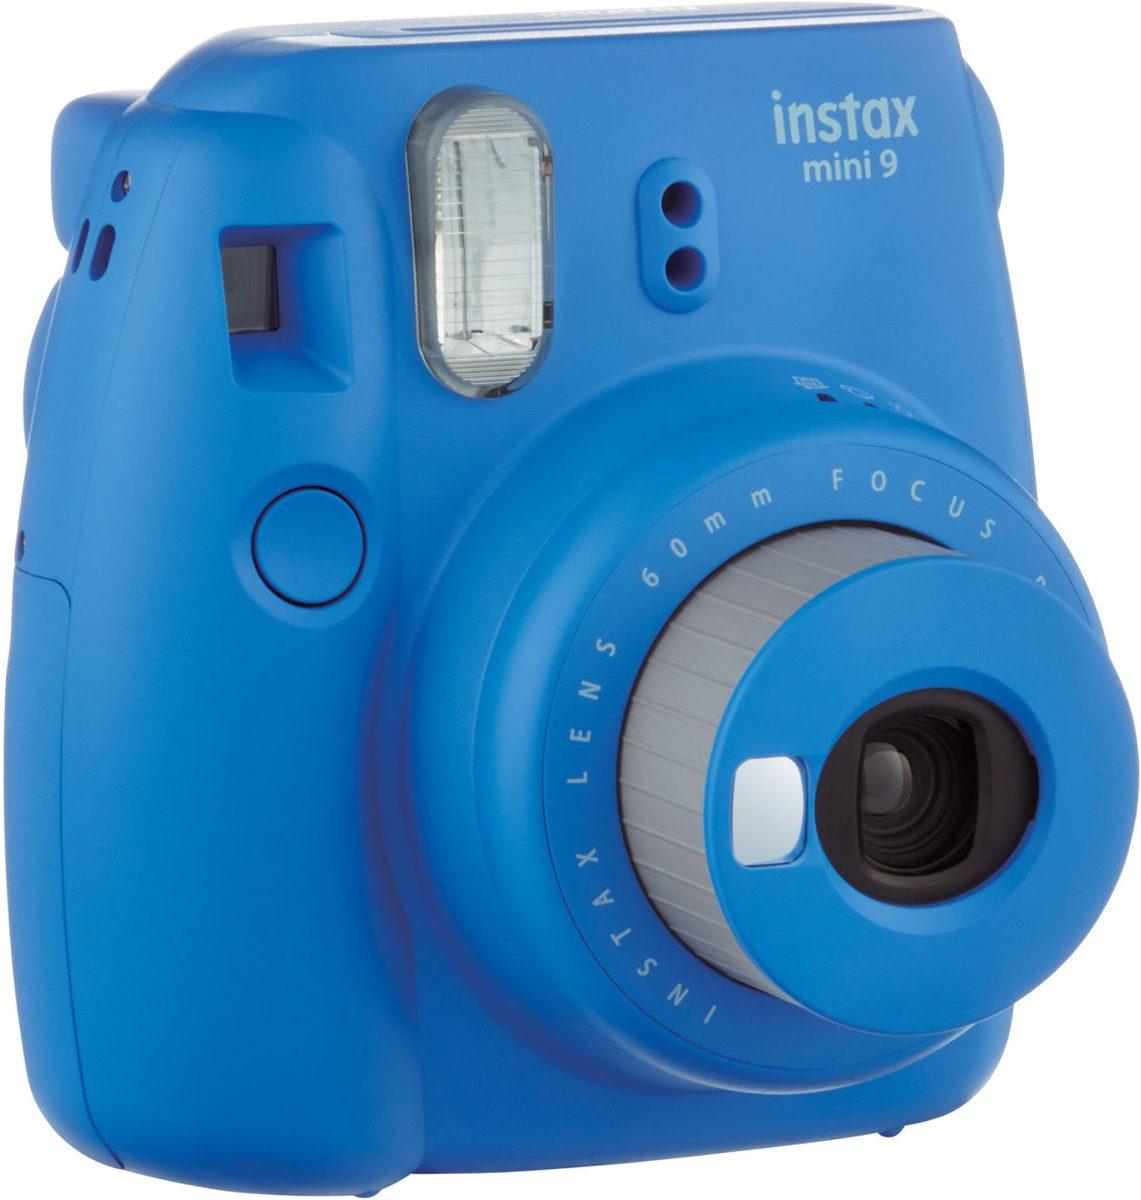 Wonderlijk bol.com   Fujifilm Instax Mini 9 - Cobalt Blue PU-82